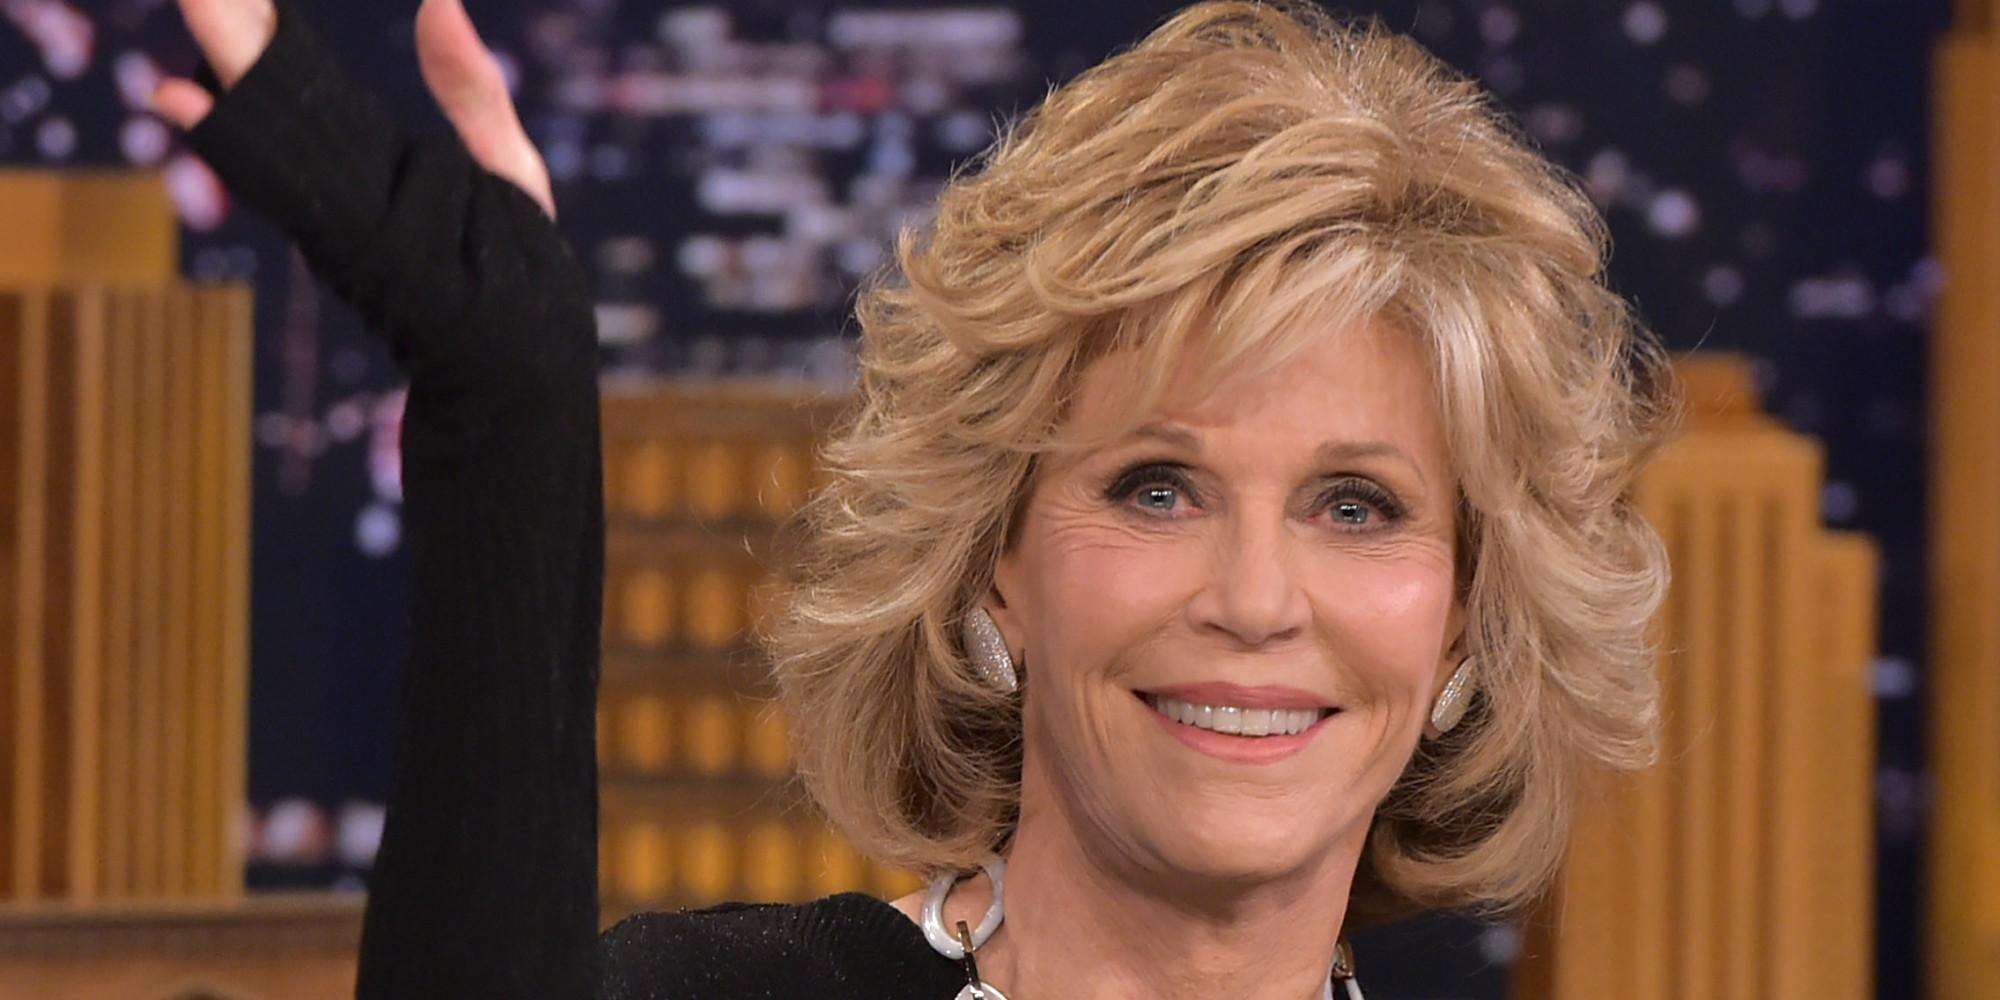 Current Jane Fonda Short Hairstyle